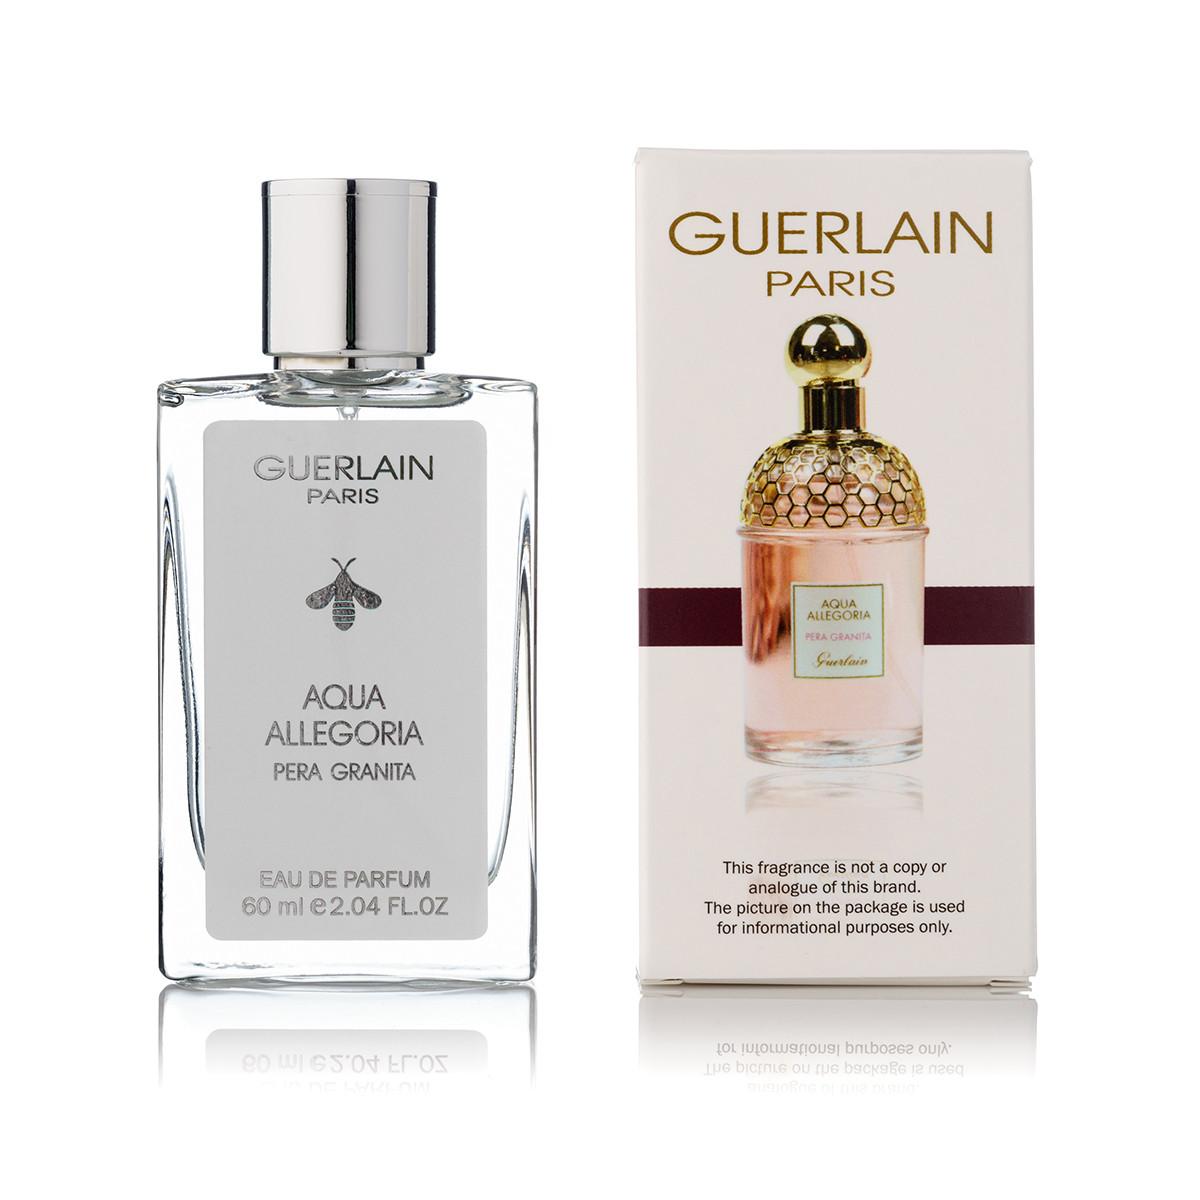 60 мл мини-парфюм Guerlain Aqua Allegoria Pera Granita -(Ж)